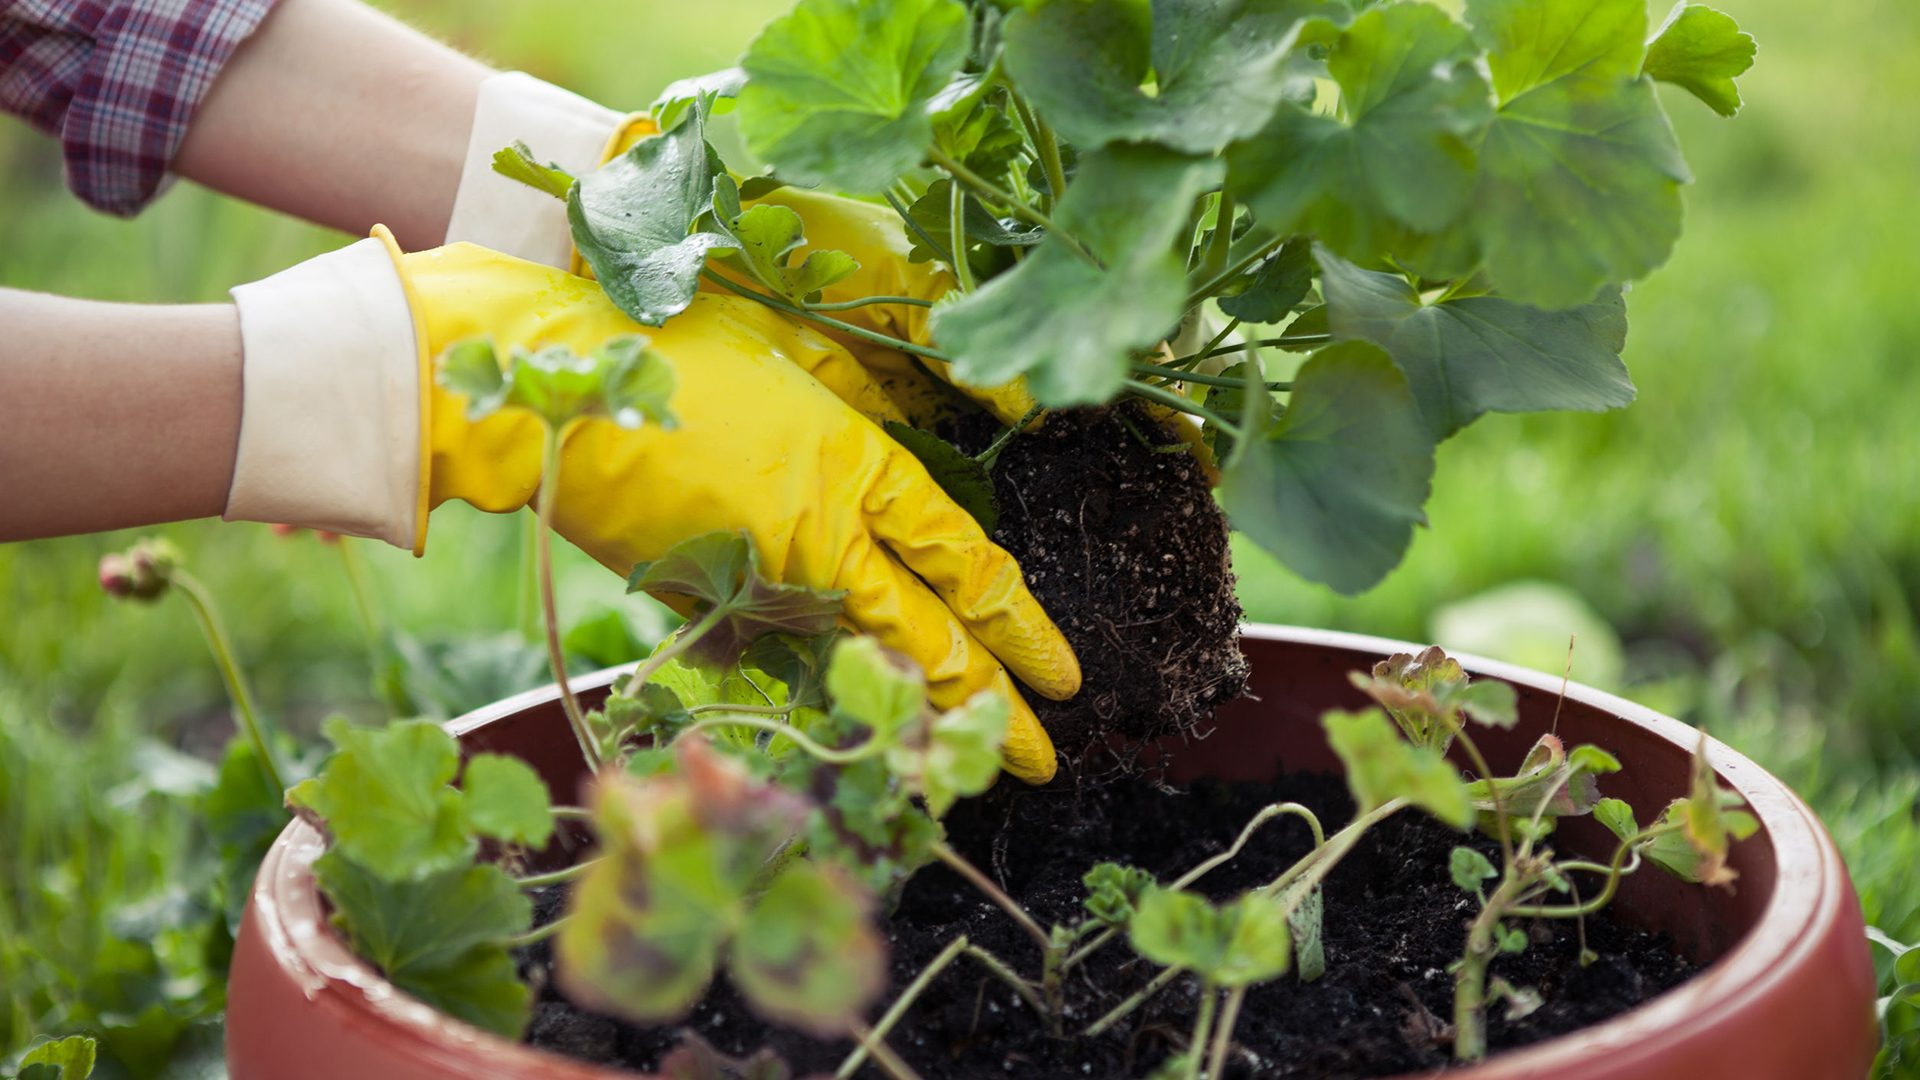 Verigrow - all-purpose fertiliser and soil improver